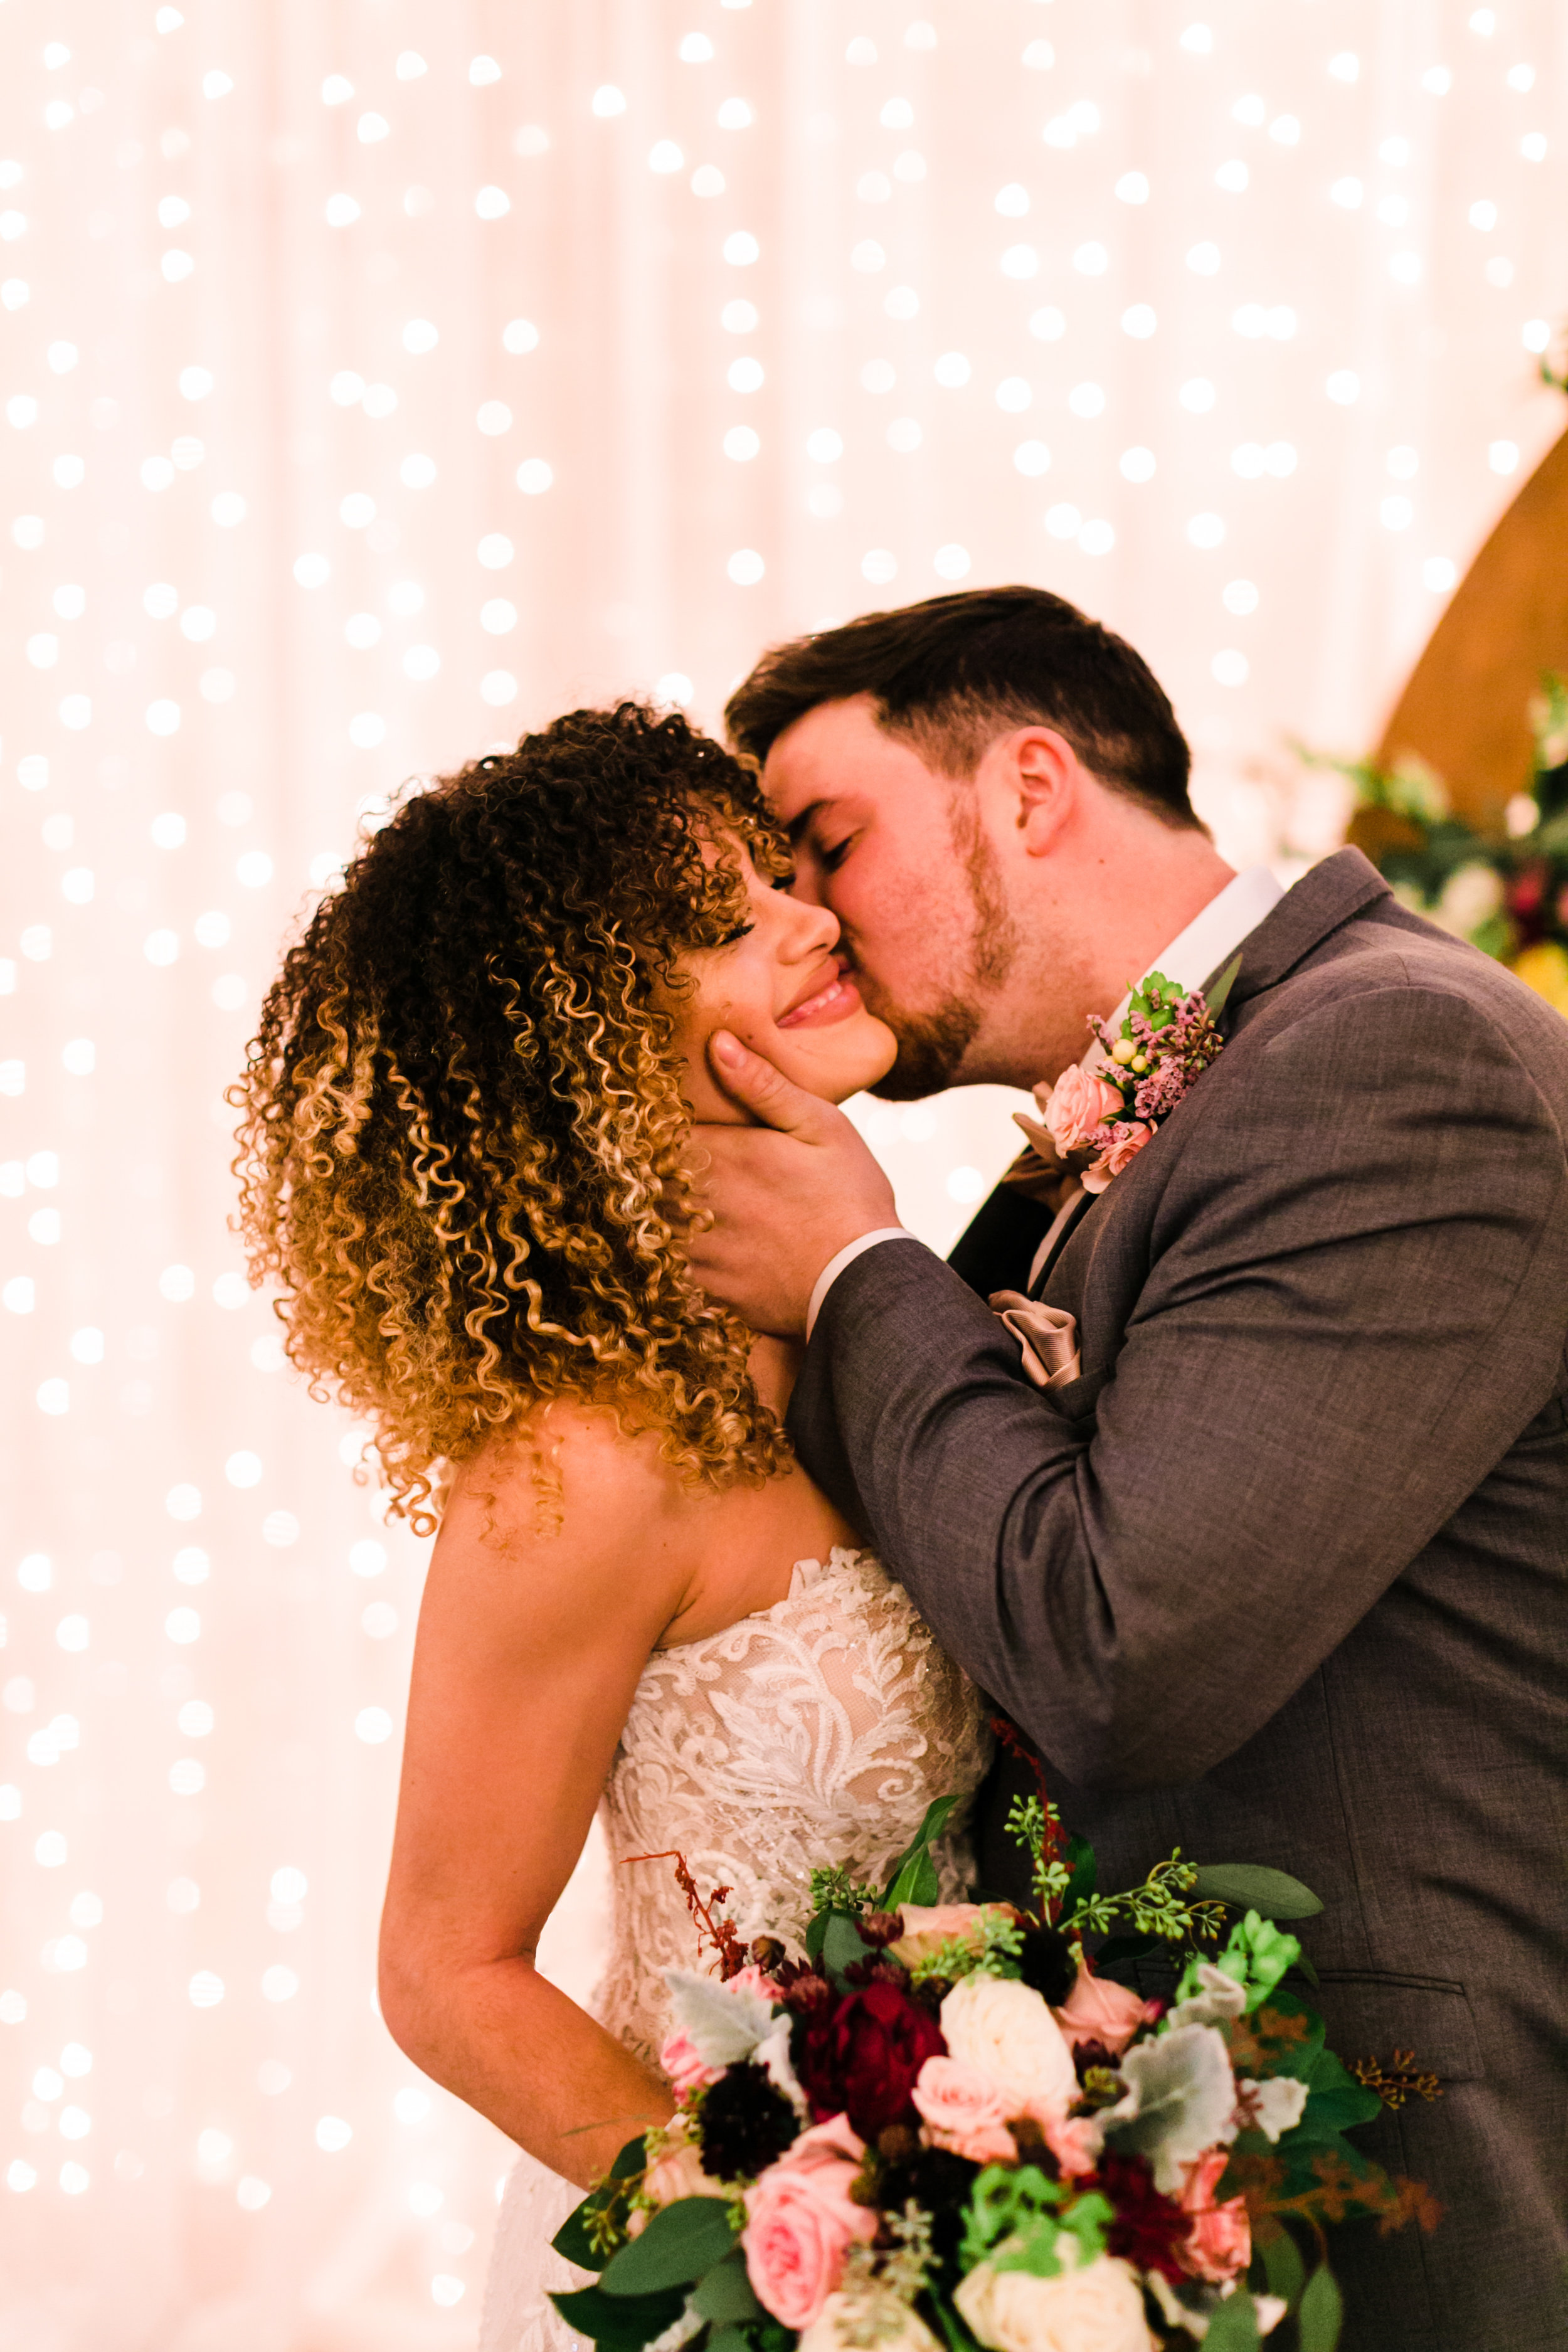 romantic+valentines+day+wedding (8 of 21).jpg